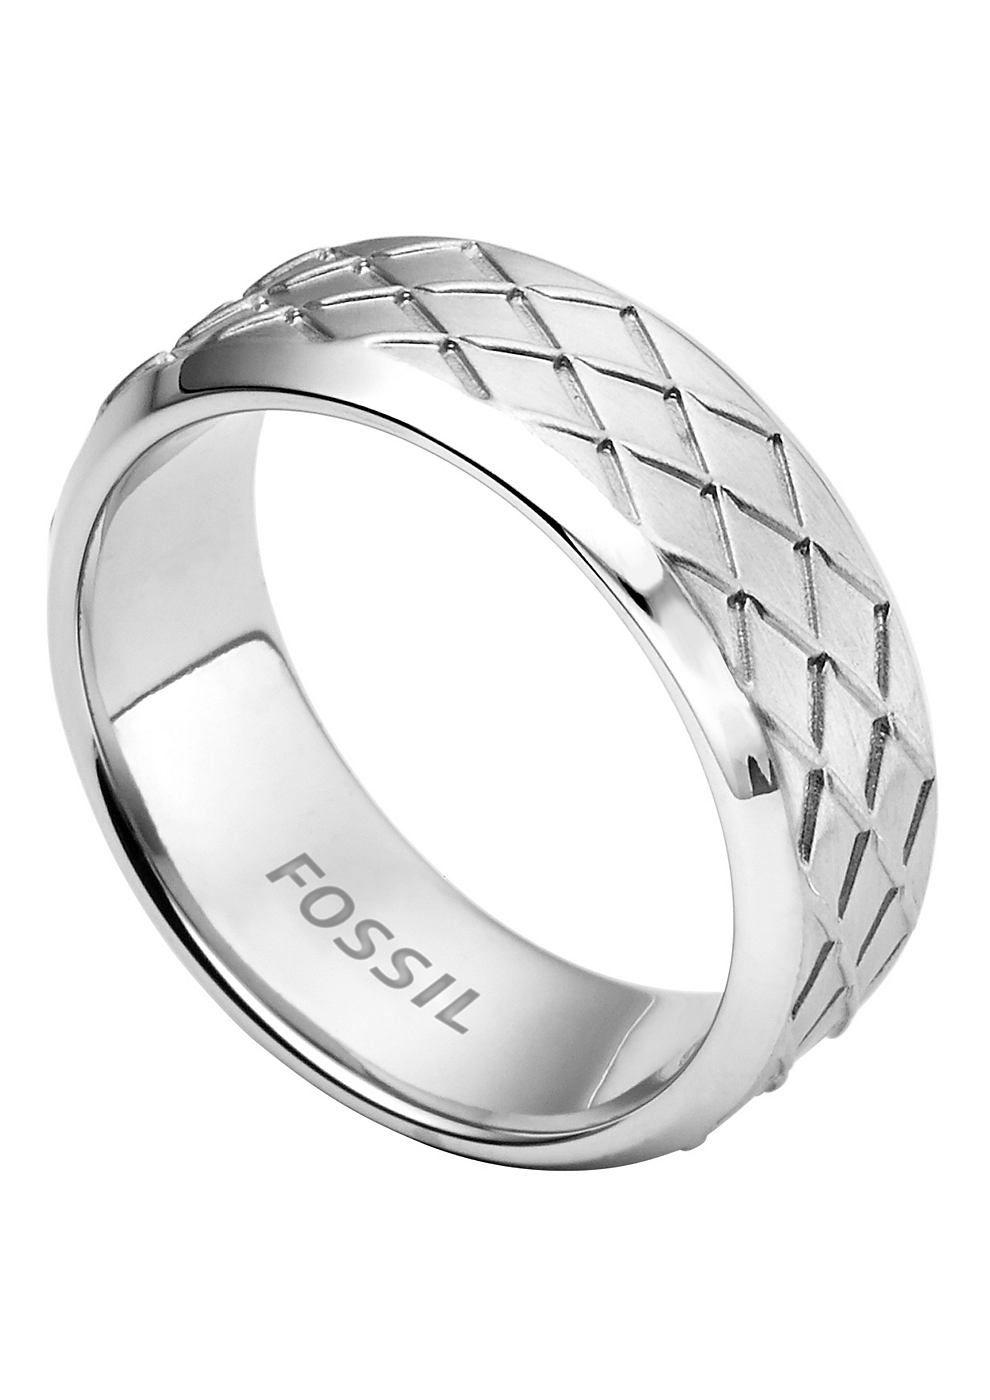 Fossil Women's Silver Ring JF02313040 LUHTTww